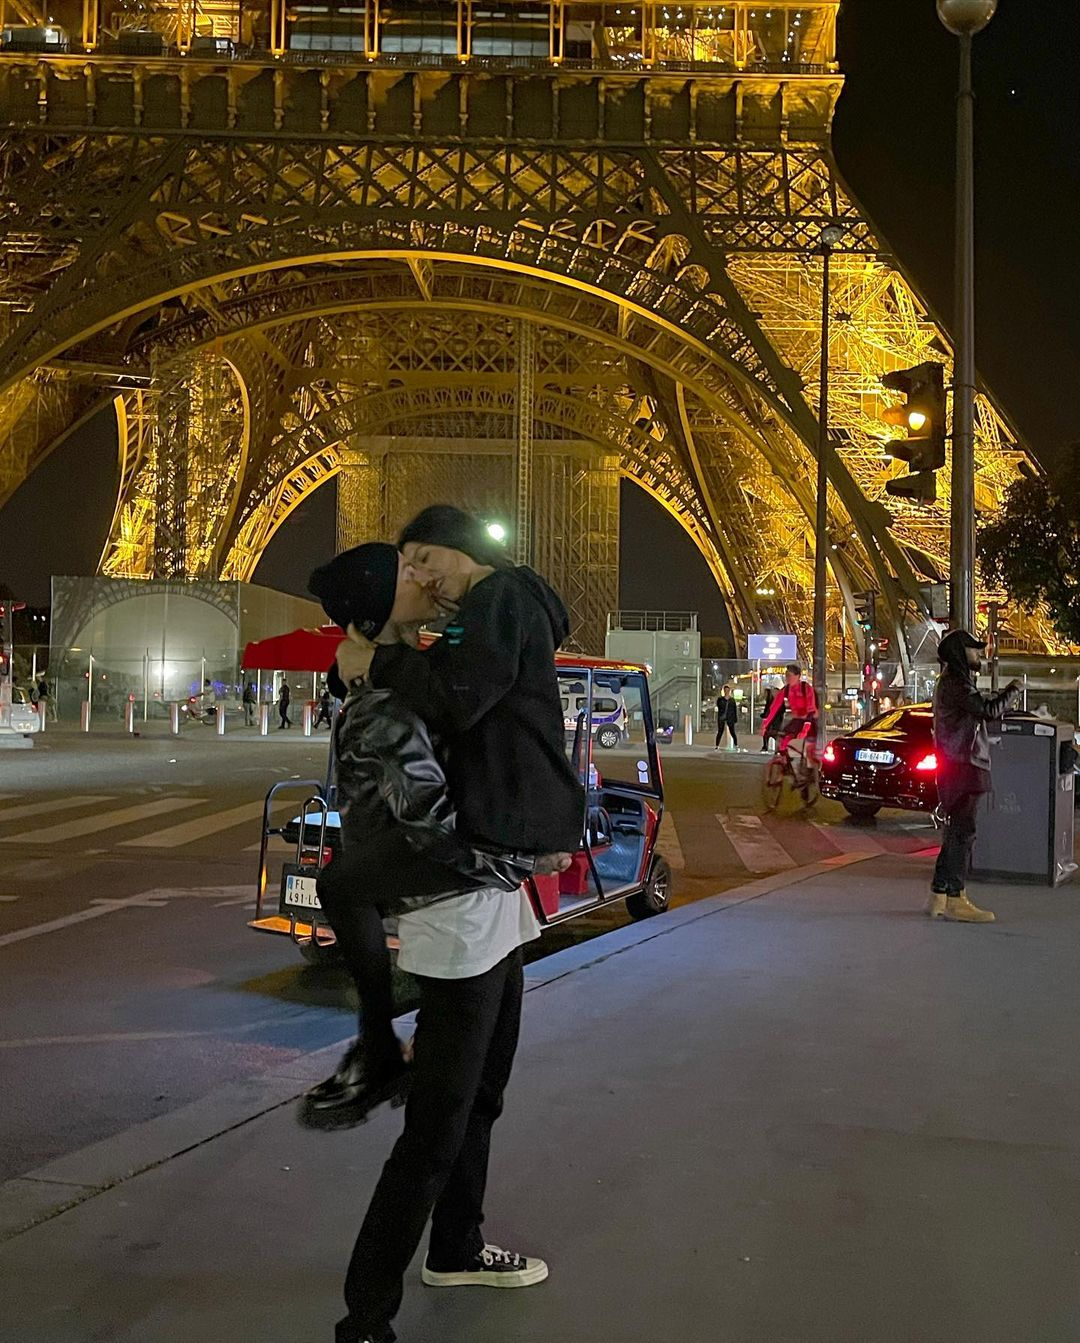 Travis Barker Shares Intimate Photos With Kourtney Kardashian From Paris Trip Amid Scott Disick Drama 4